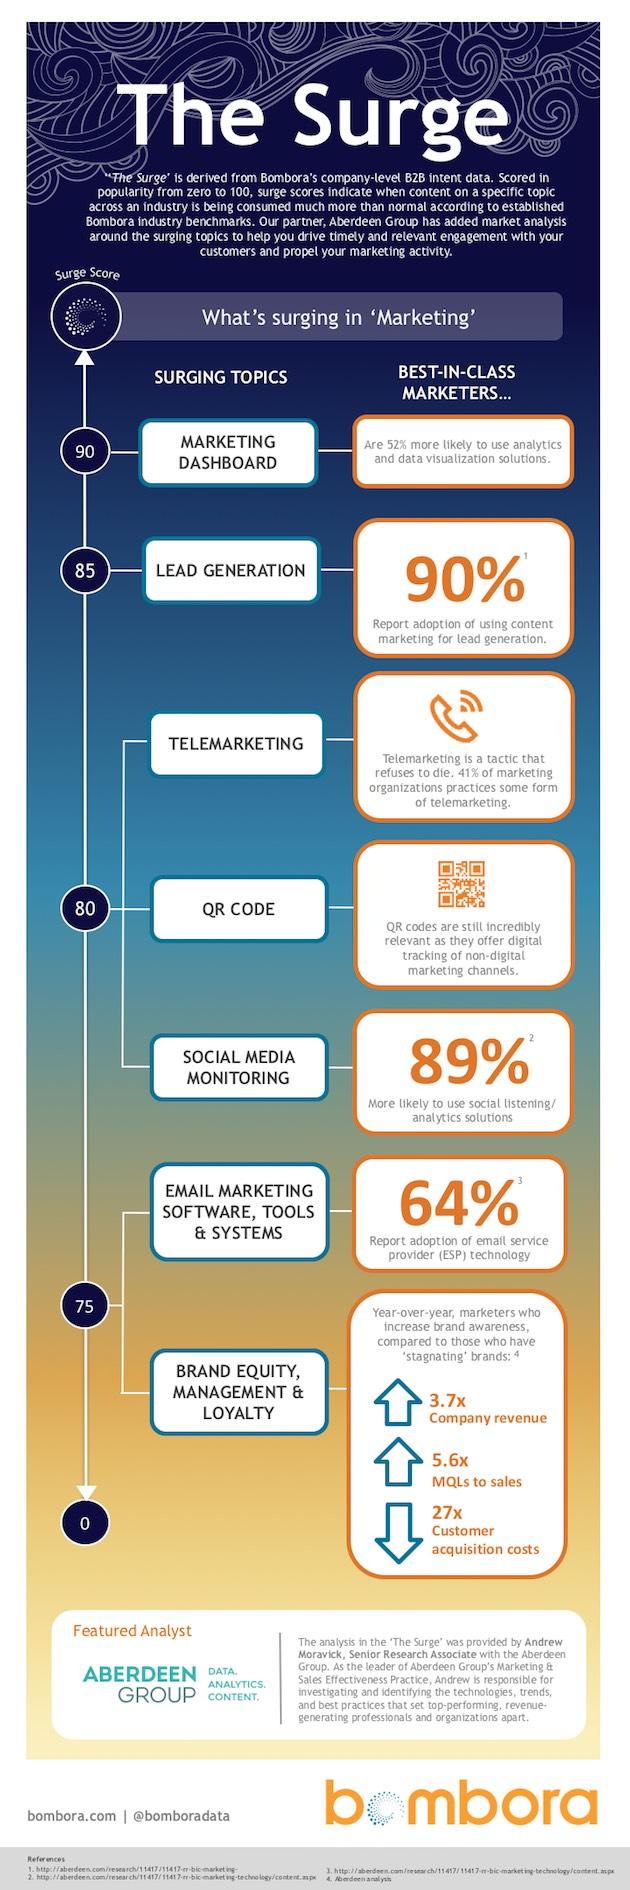 Trending Content Topics in B2B Marketing - MarketingSmartGuide